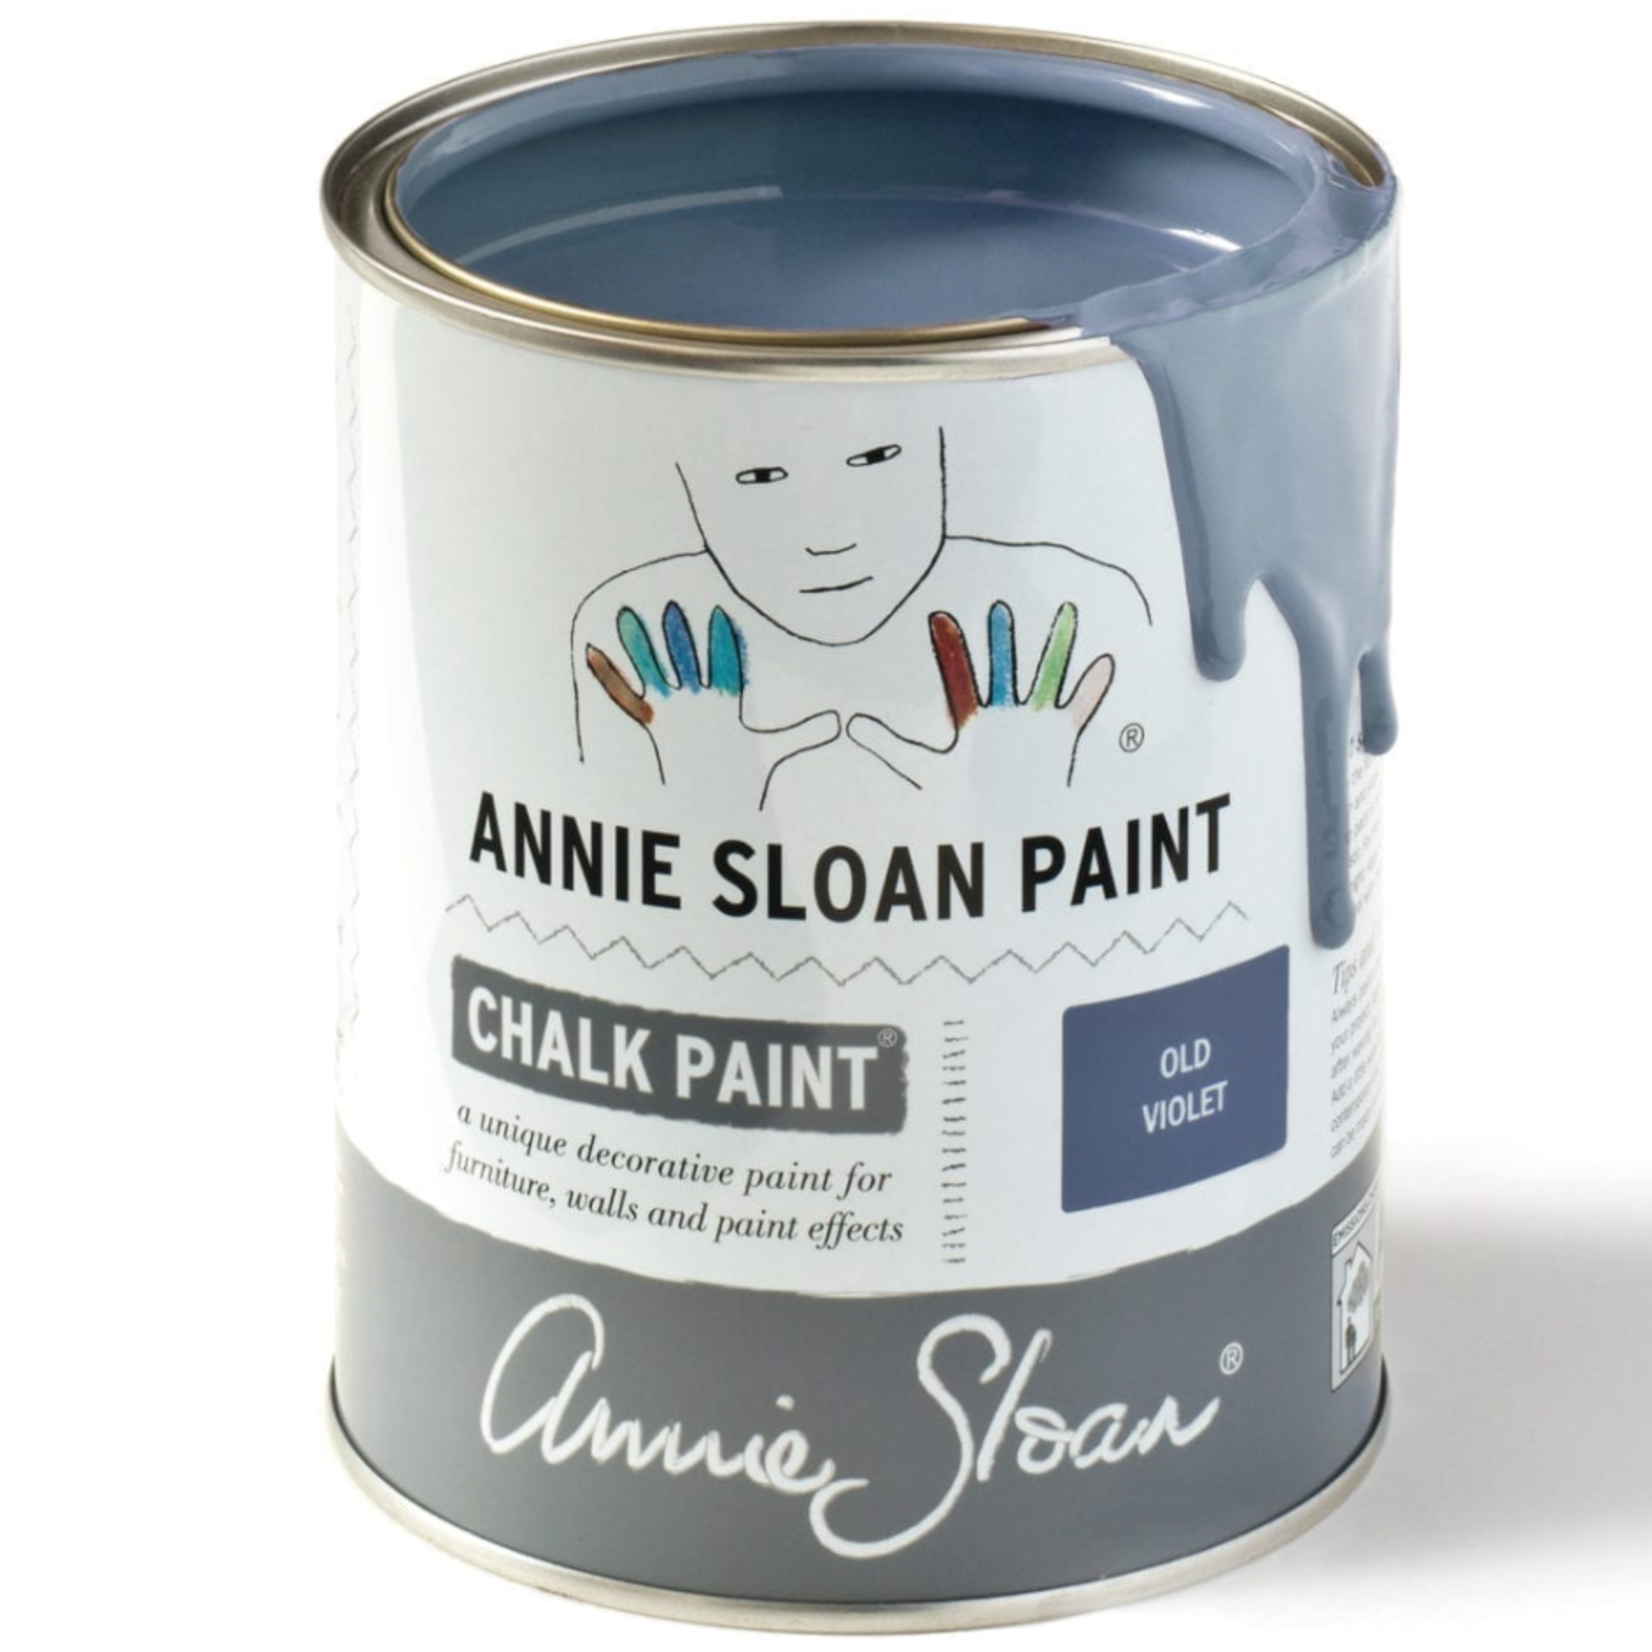 Annie Sloan Annie Sloan Old Violet Chalk Paint